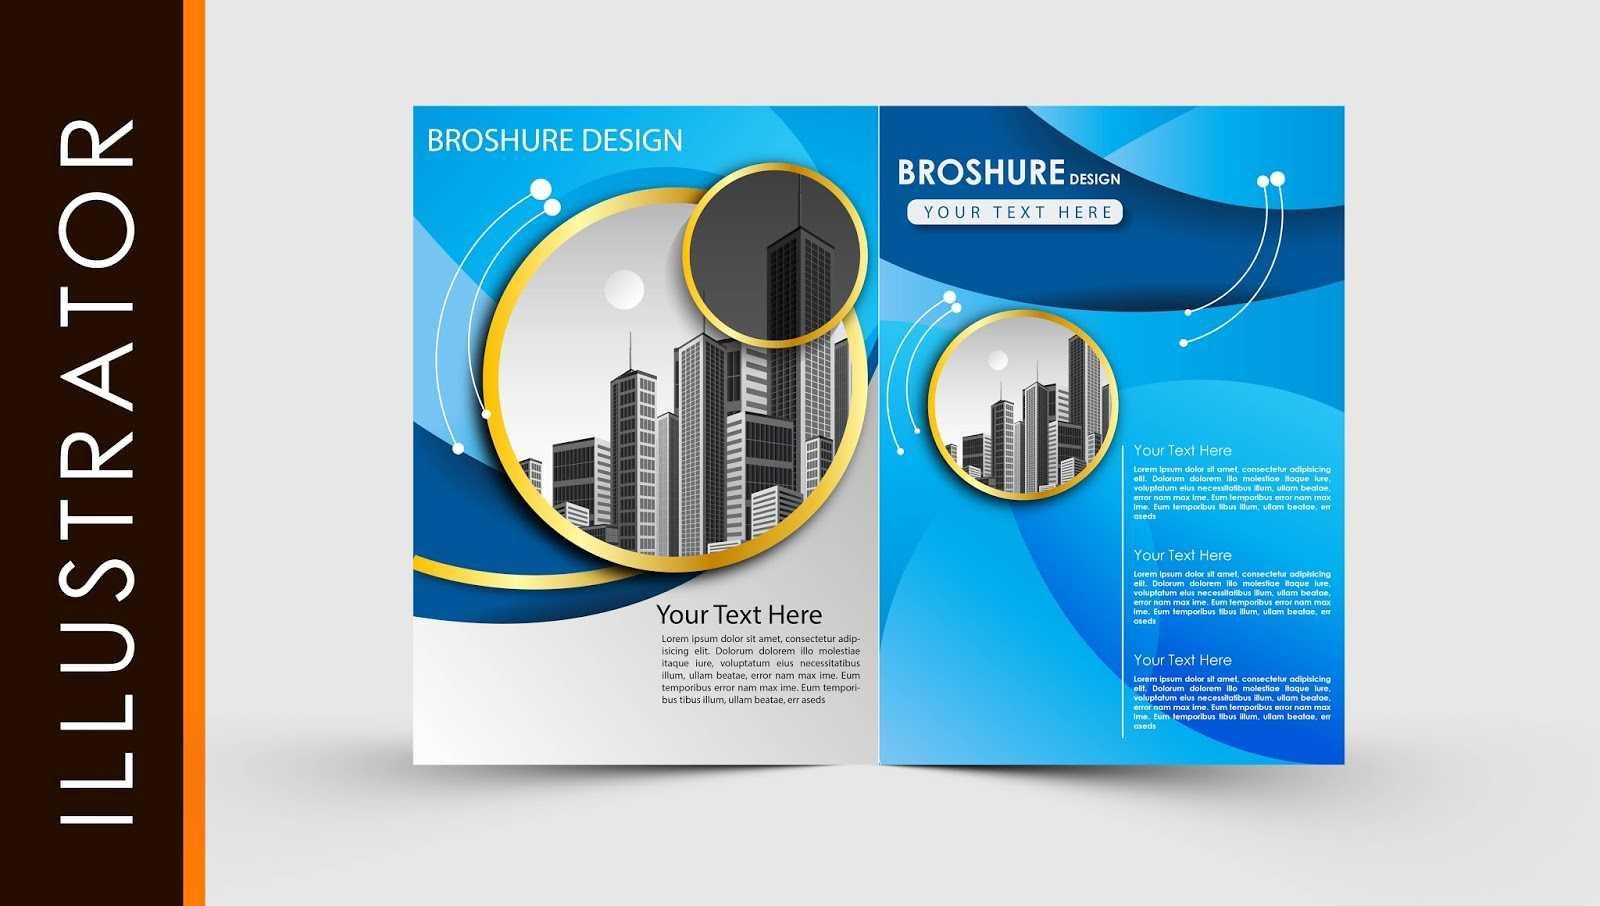 Free Download Adobe Illustrator Template Brochure Two Fold Regarding Adobe Illustrator Brochure Templates Free Download